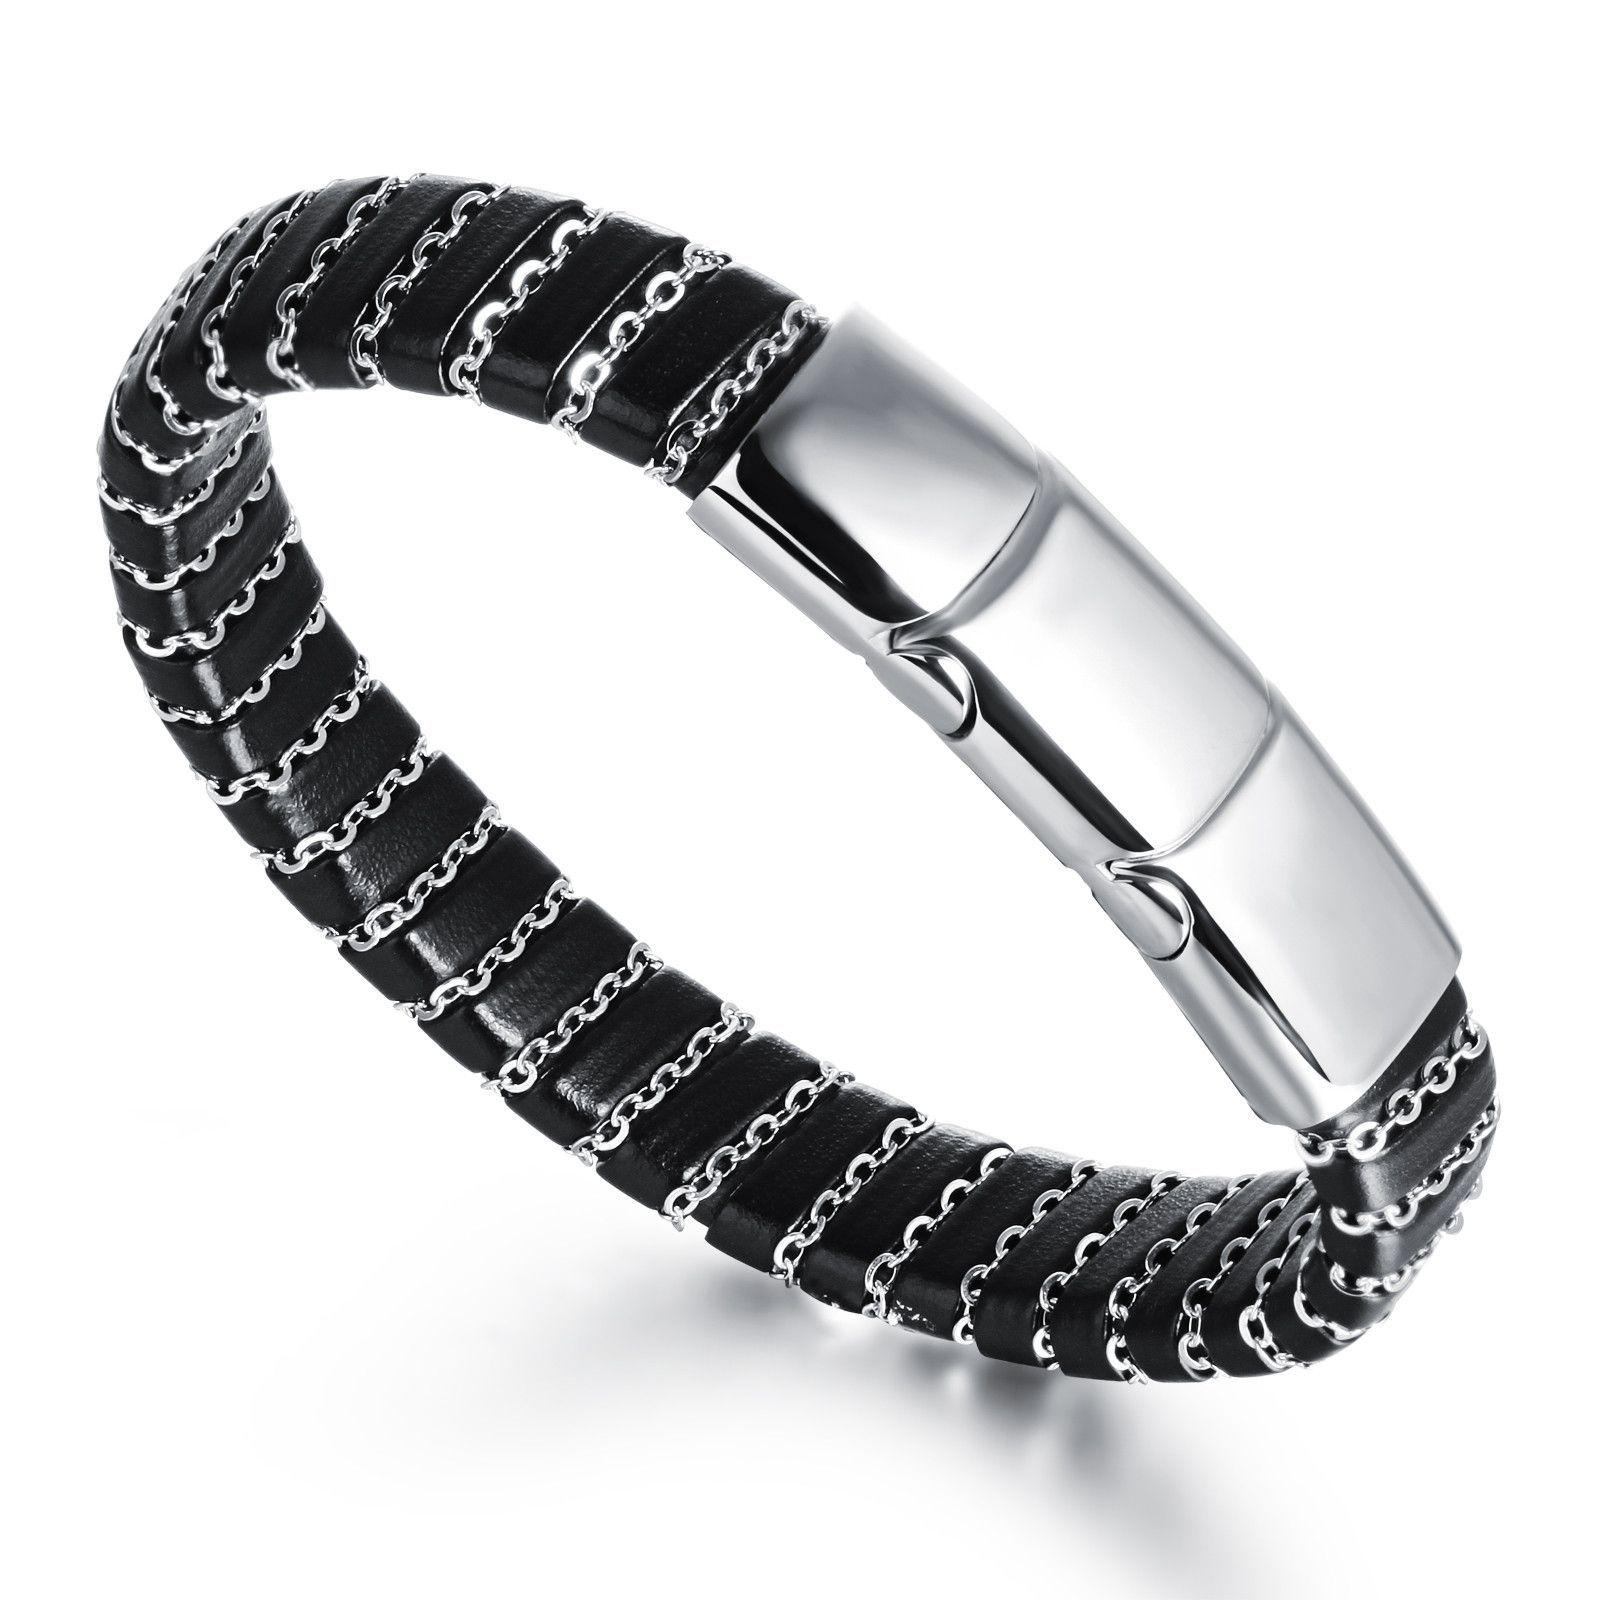 Punk rock style alternative o word chain braided leather manus wrist